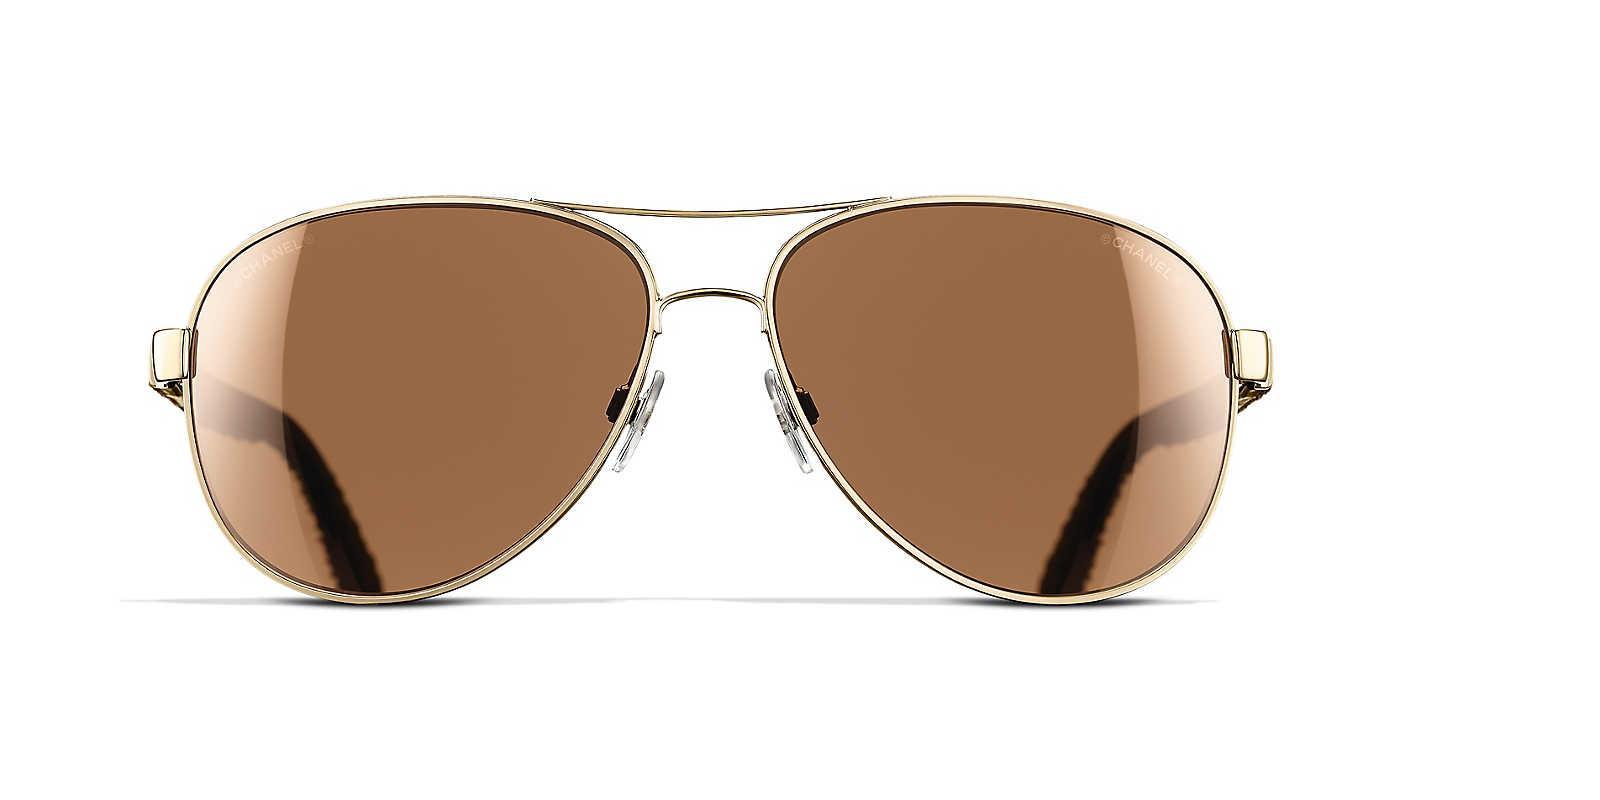 ac8e857a951 Chanel Pilot Sunglasses in Metallic - Lyst